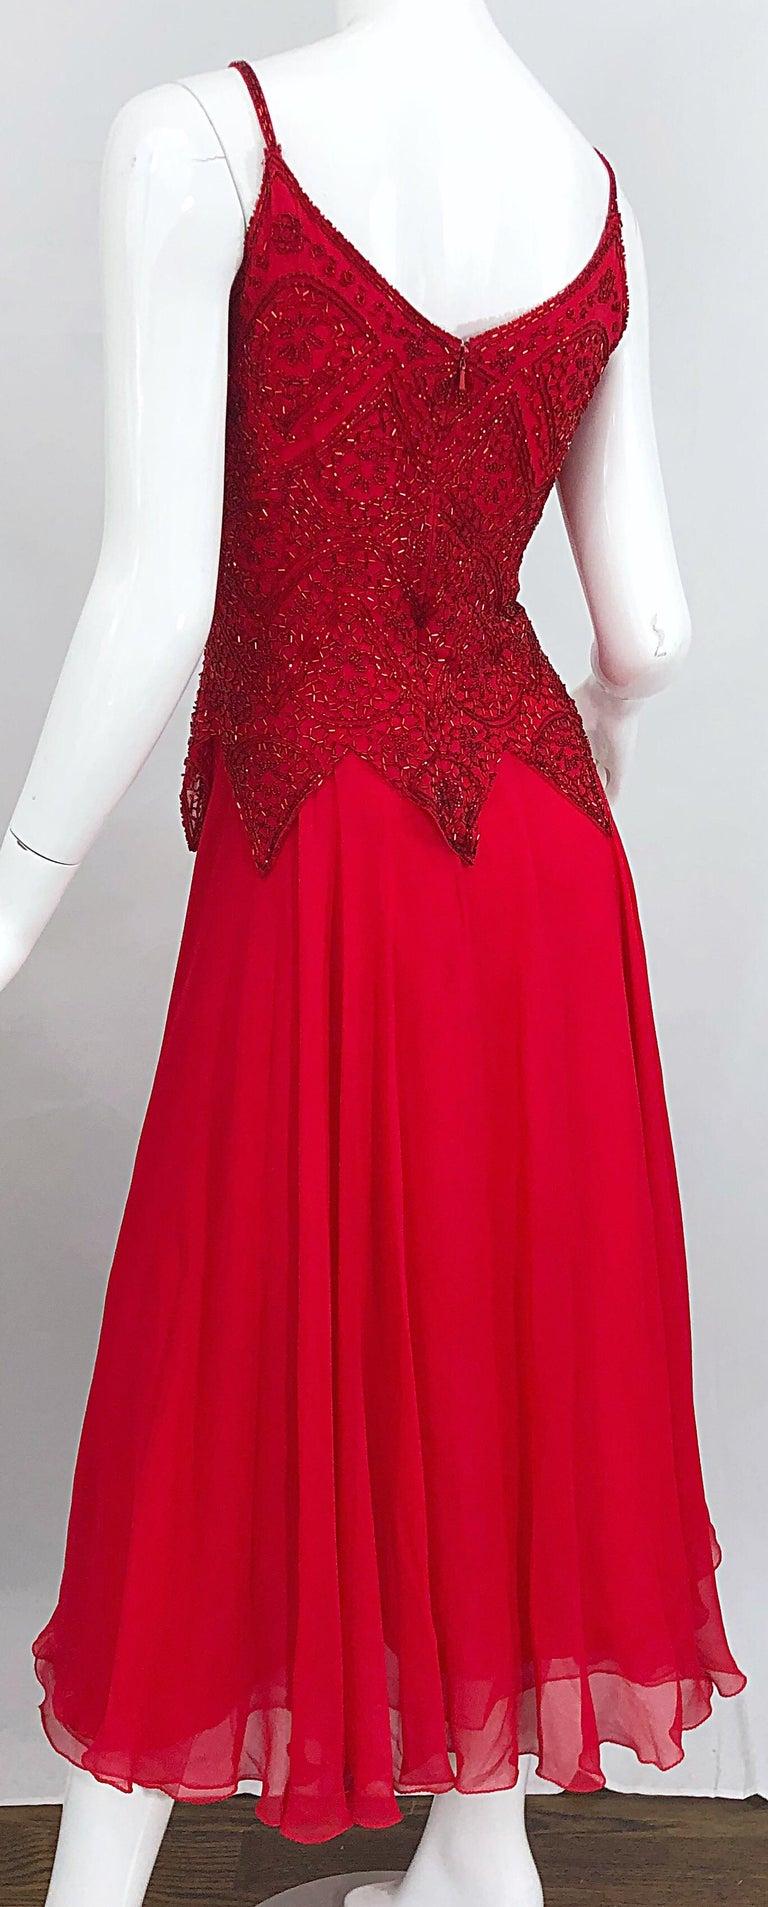 1970s Oleg Cassini Size 10 / 12 Red Silk Chiffon Beaded Handkerchief Midi Dress For Sale 4